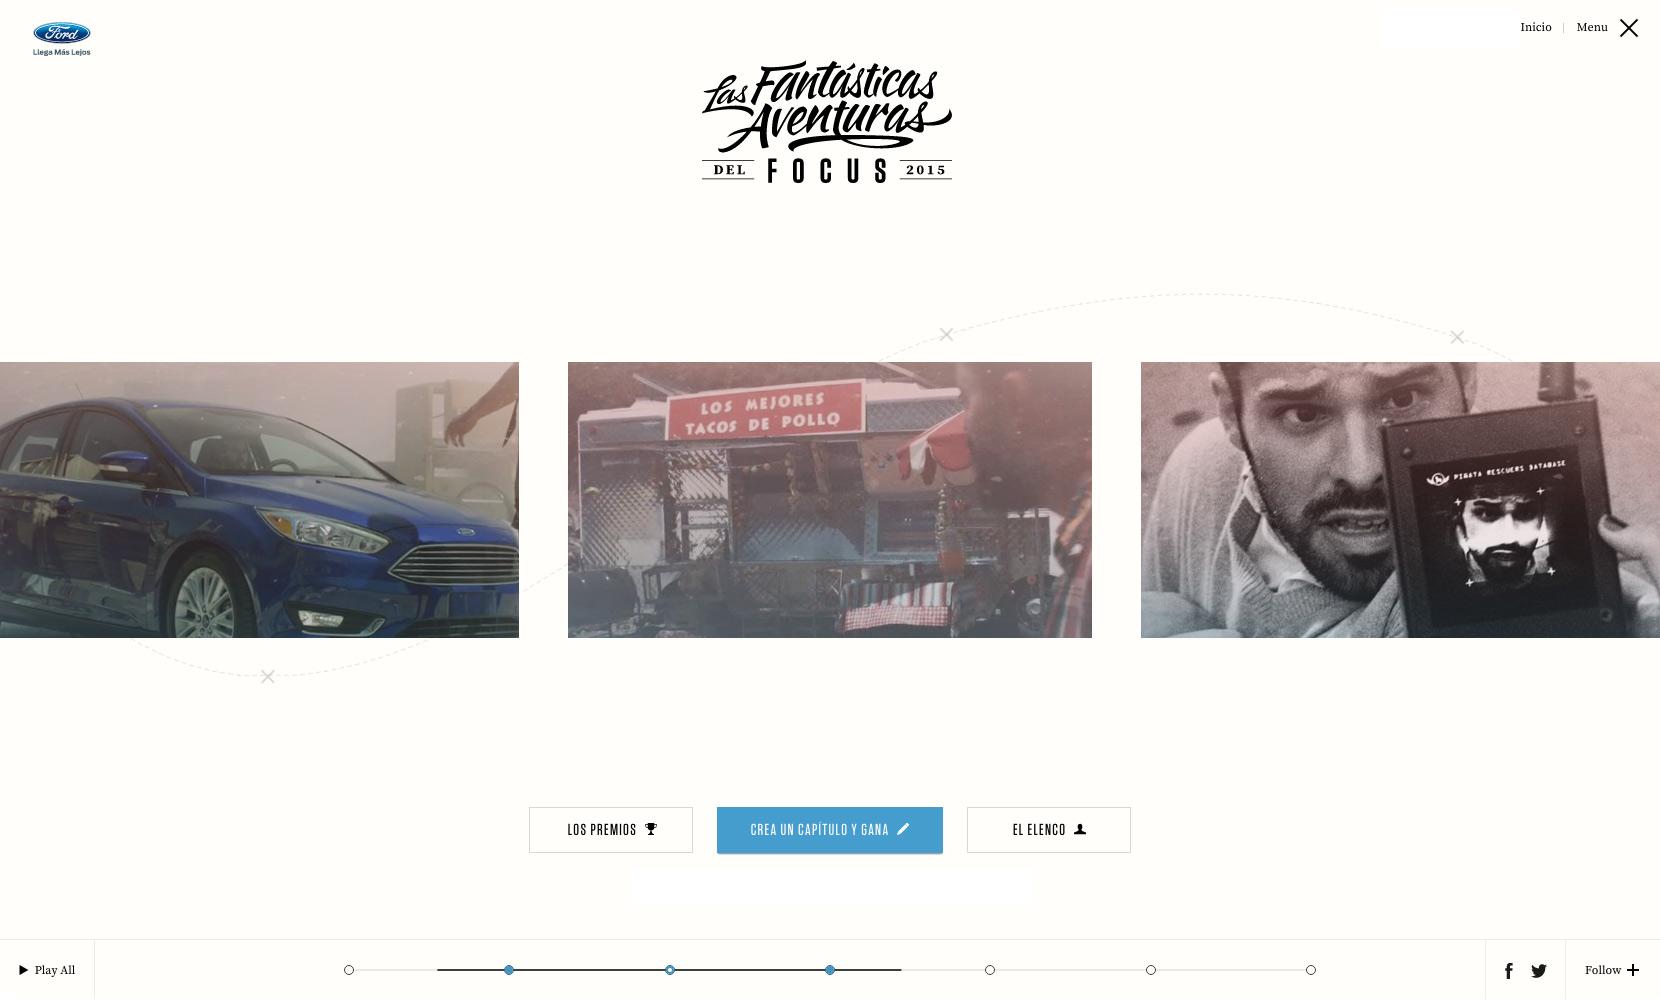 MB_fantasticas-aventuras_menu